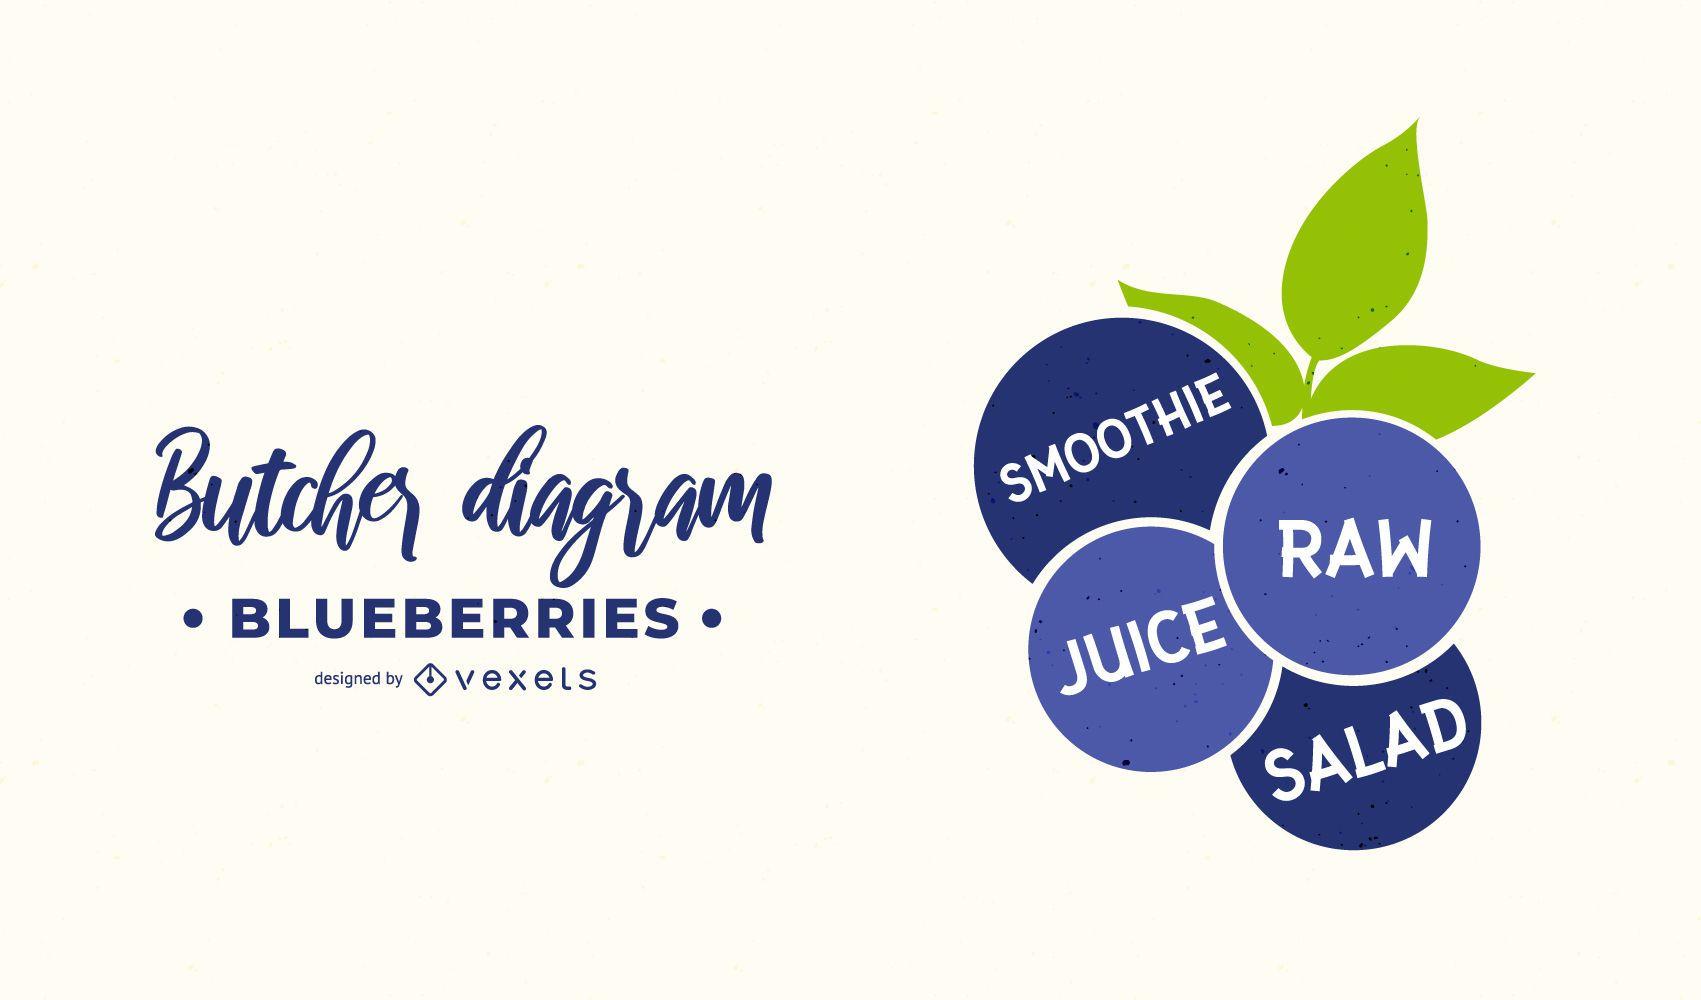 Blueberries Butcher Diagram